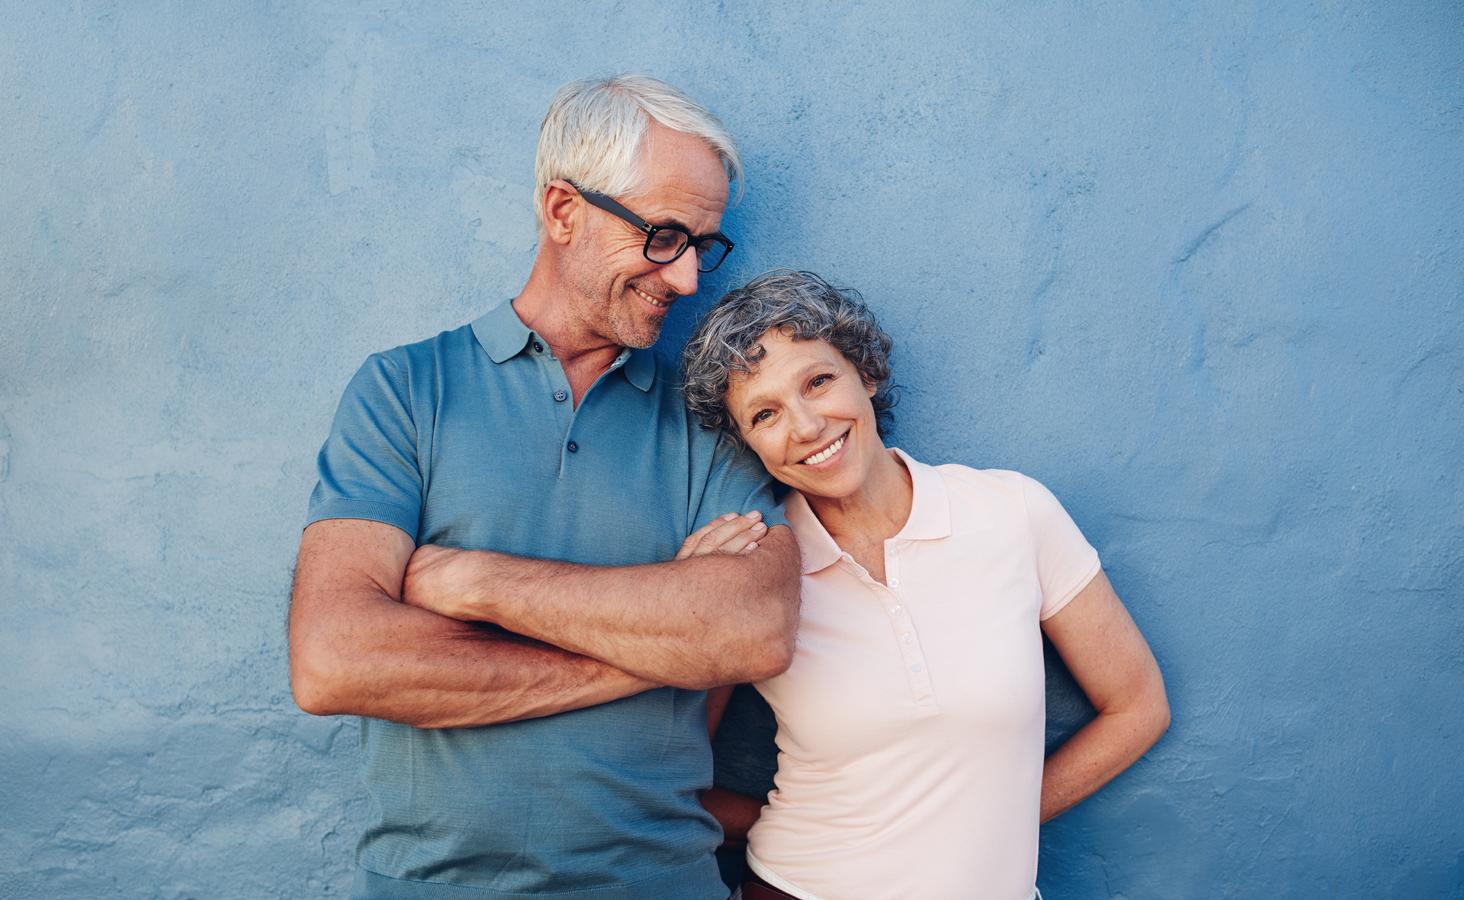 OLDER-HUSBAND-AND-WIFE-AGAINST-WALL-DESKTOP